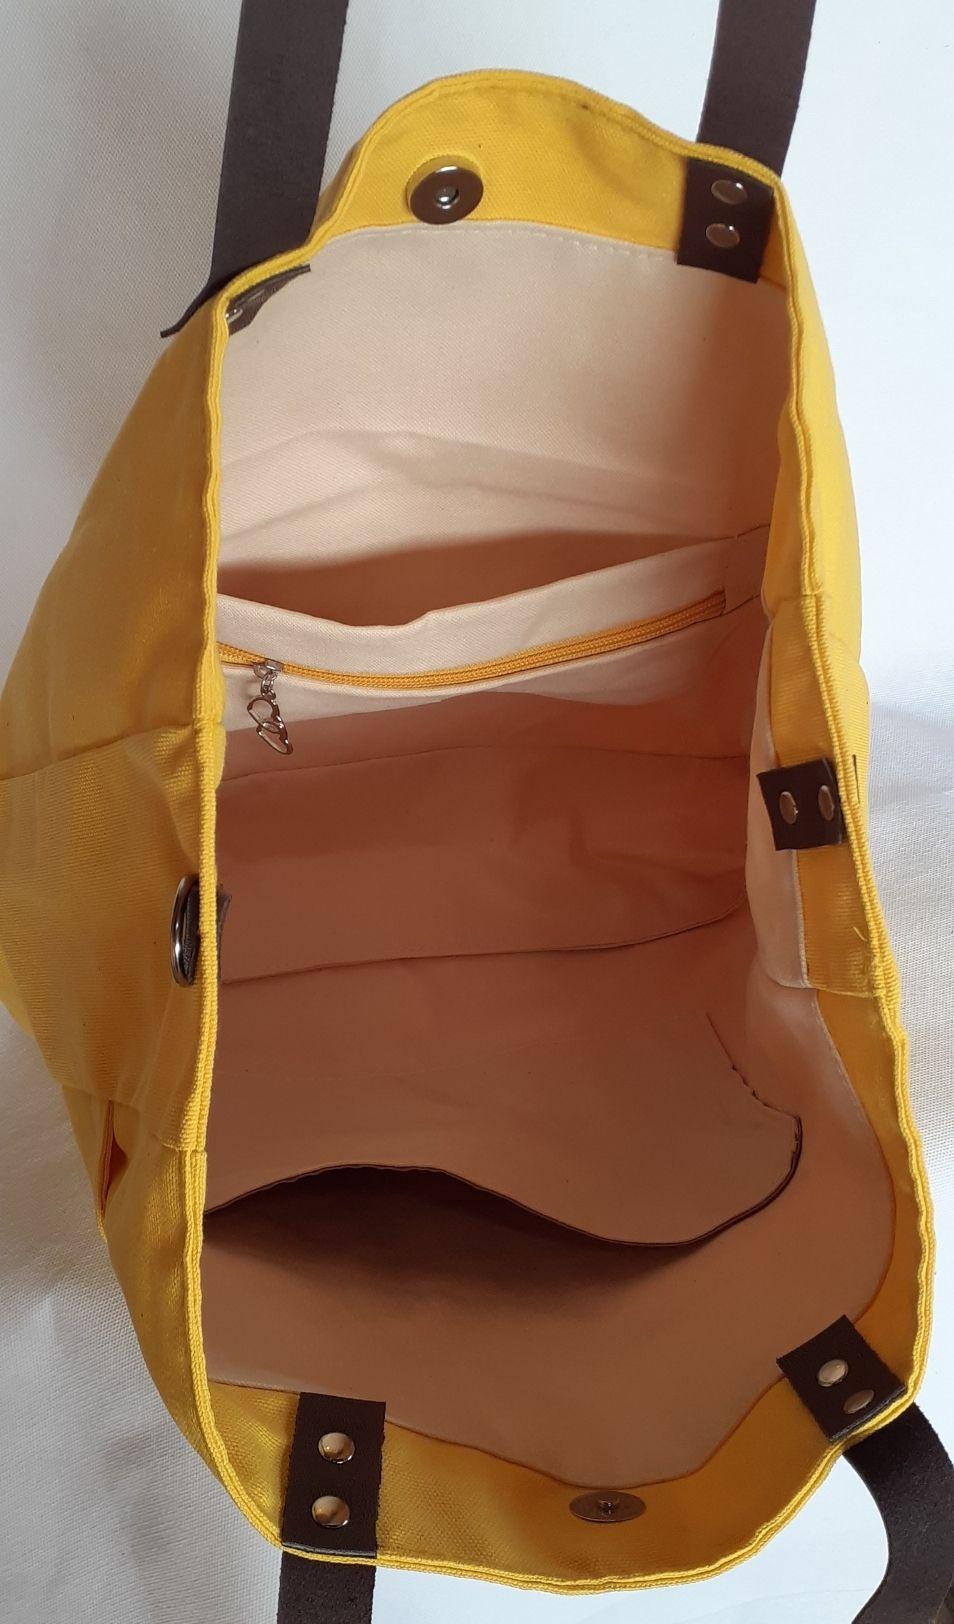 Bolsa maccril amarela de tecido